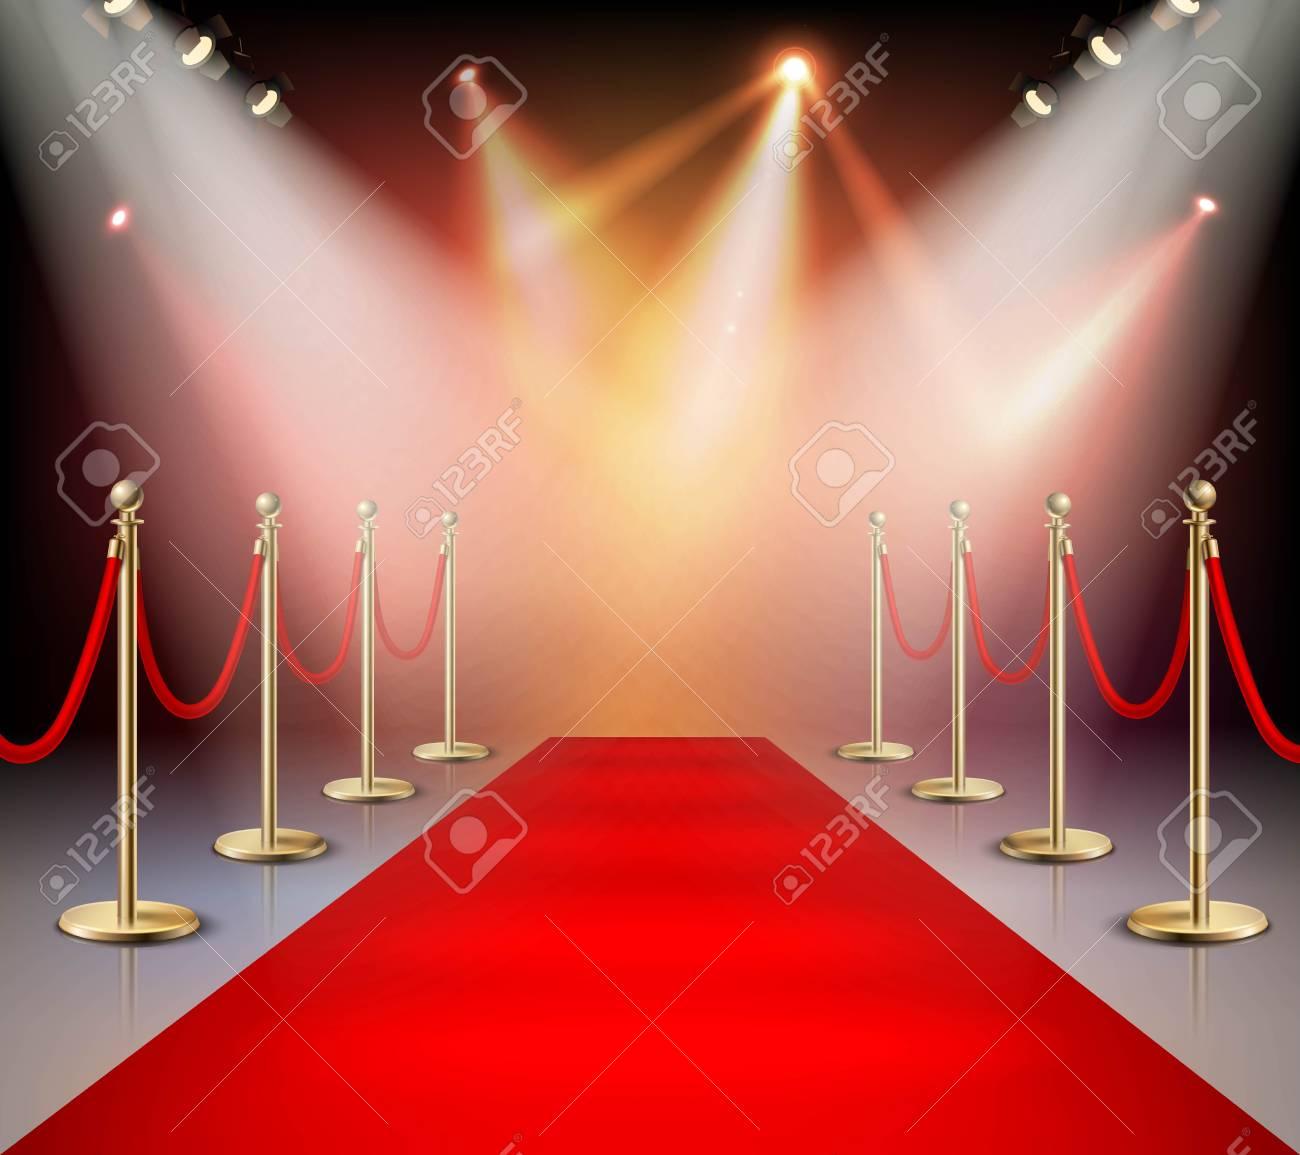 realistic red carpet in illumination composition event or award rh 123rf com red carpet victoria secret shanghai 2017 red carpet vector free